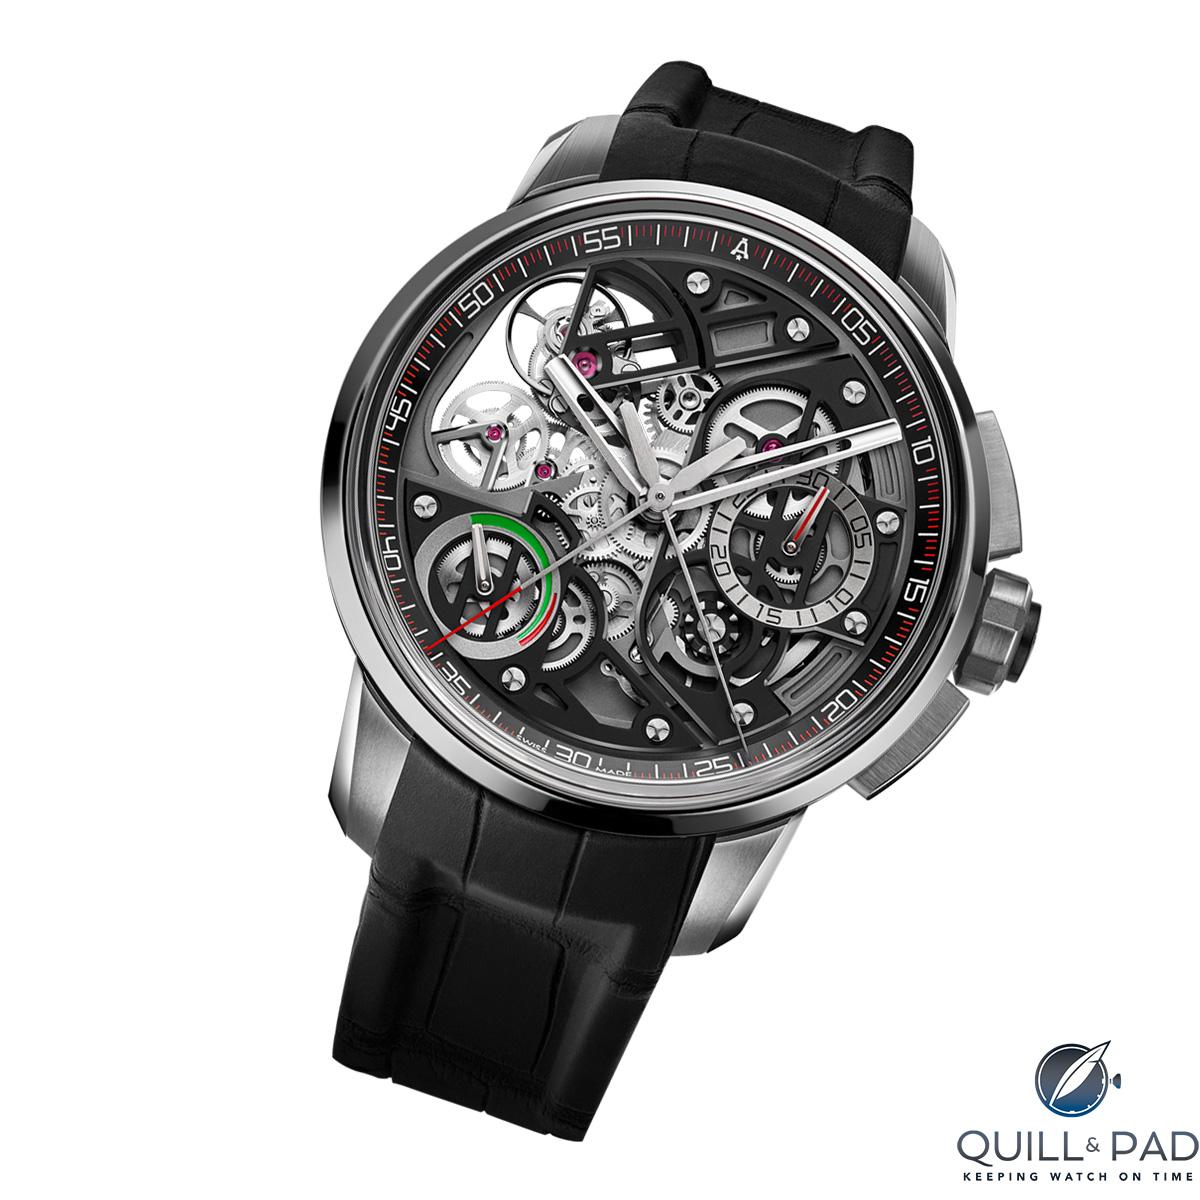 Angelus U30 Tourbillon Rattrapante chronograph